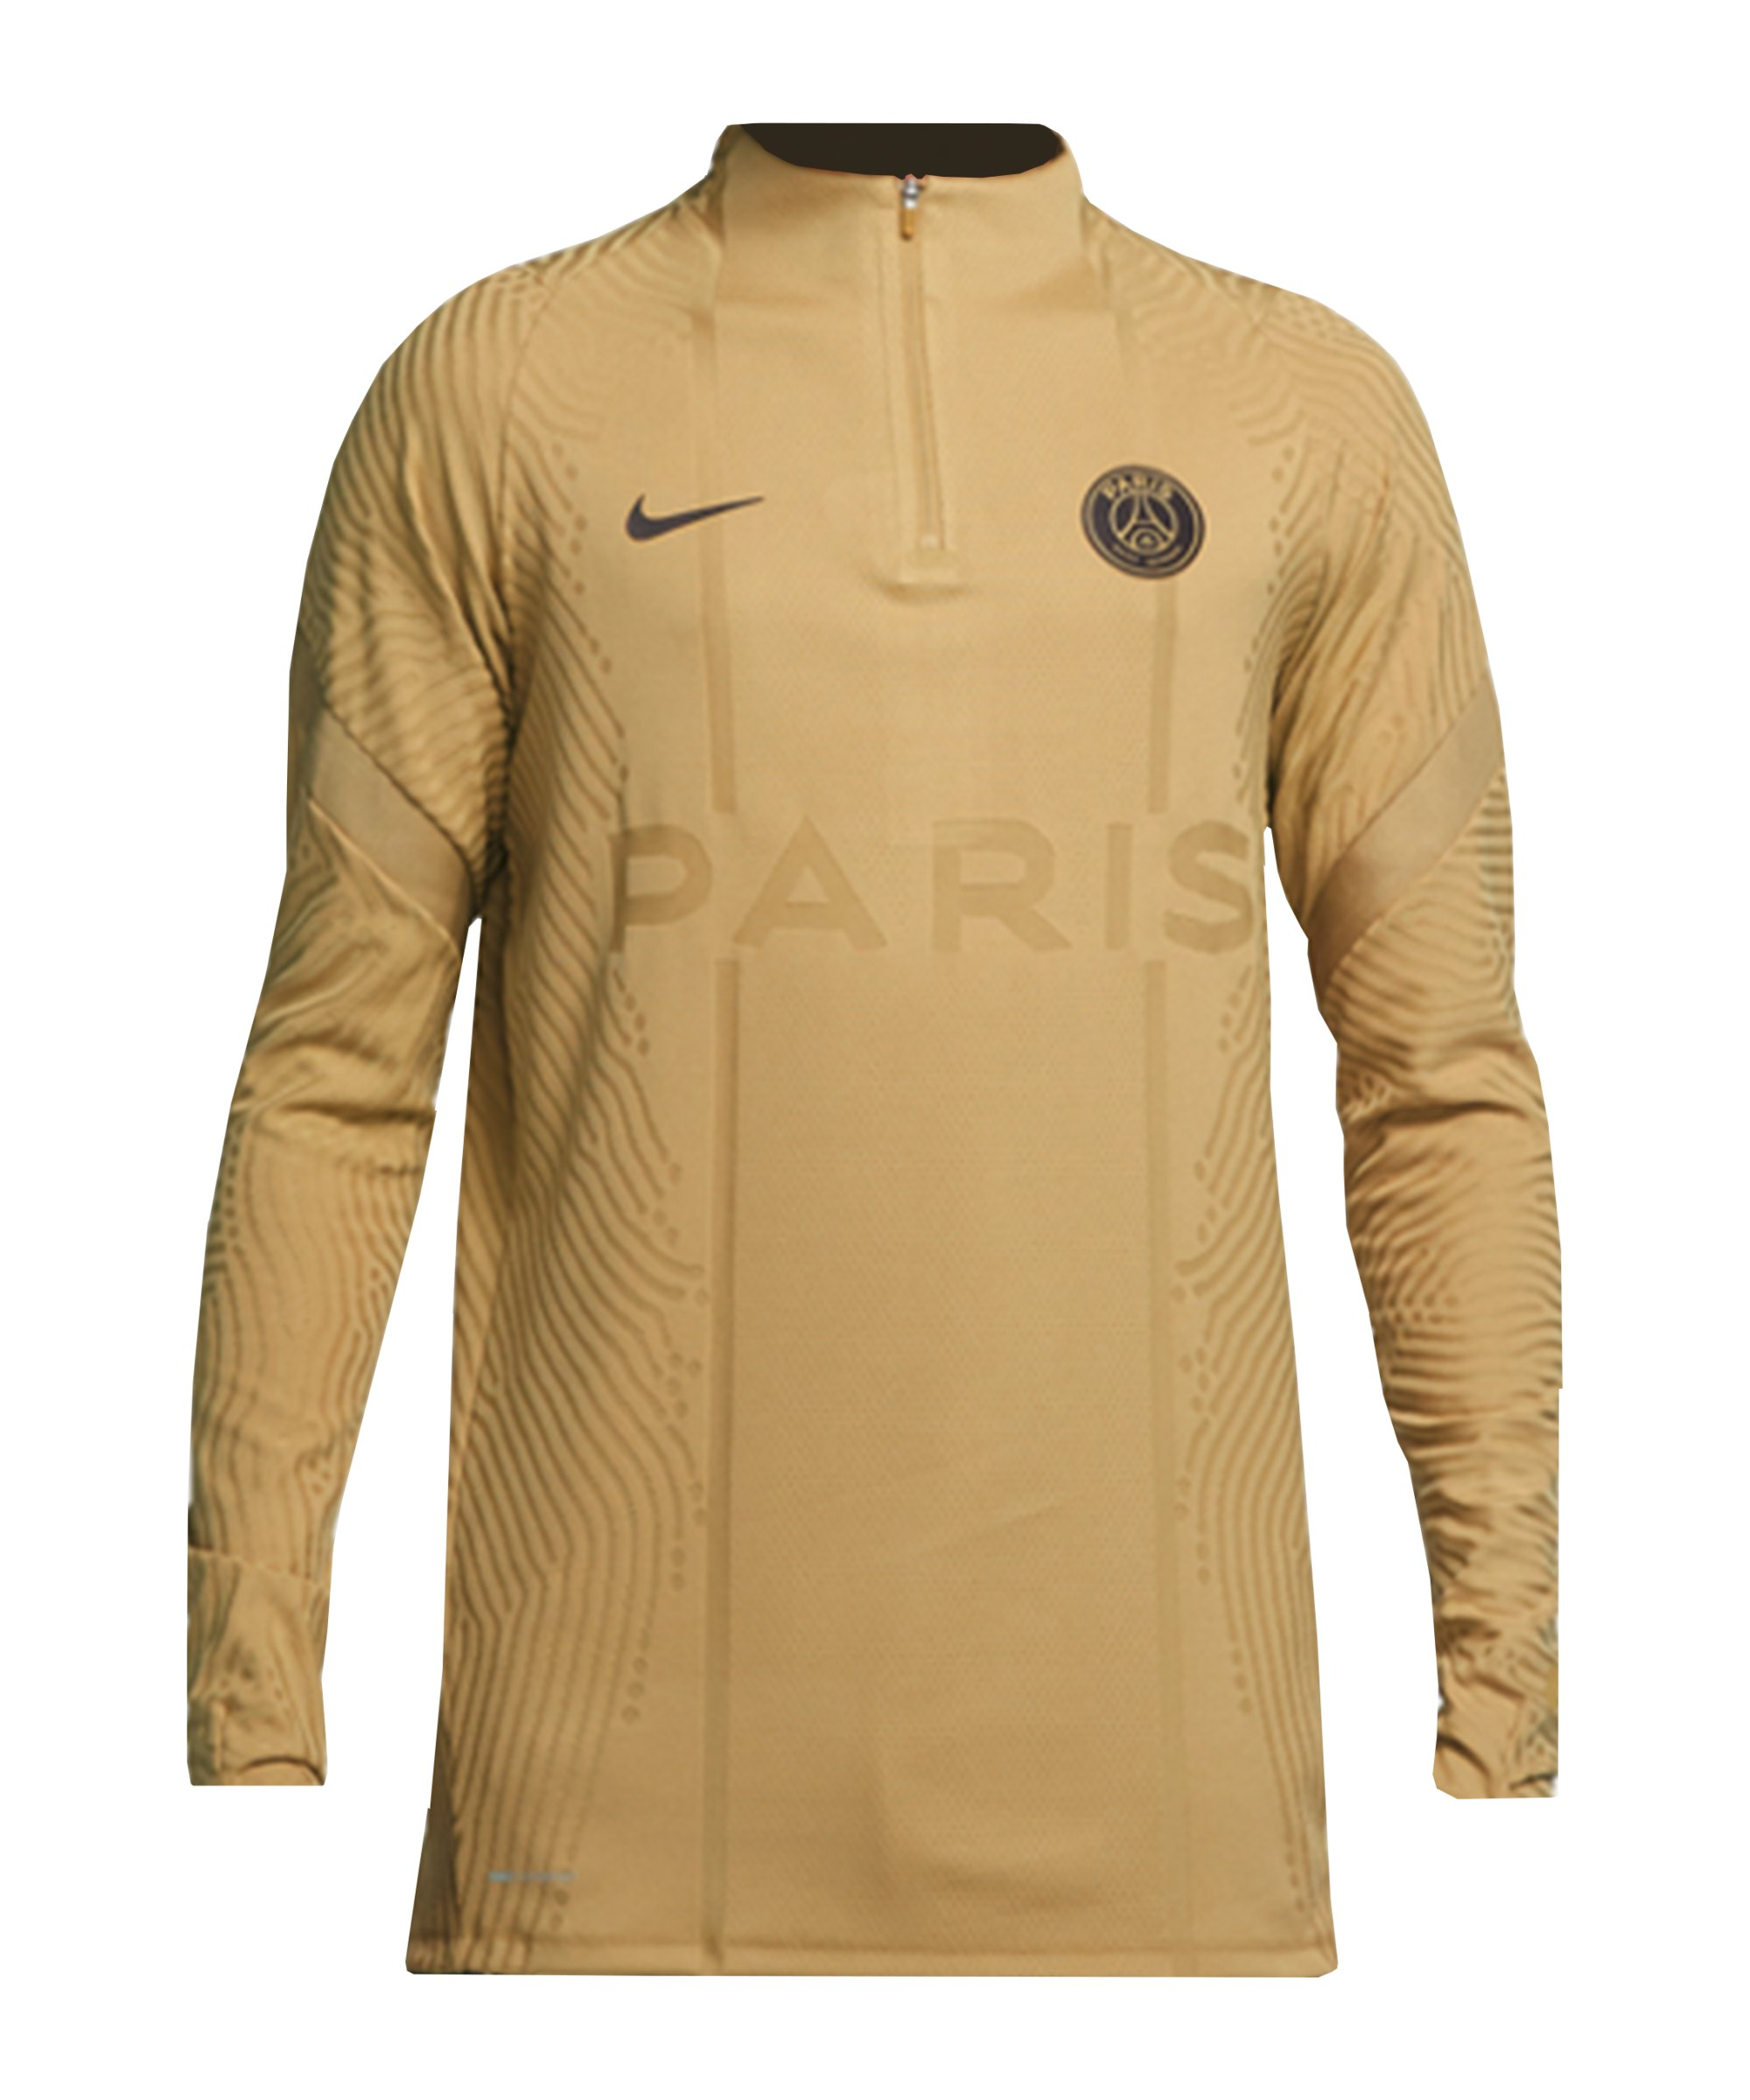 Nike Paris St. Germain Vaporknit Drill Top F710 - gold